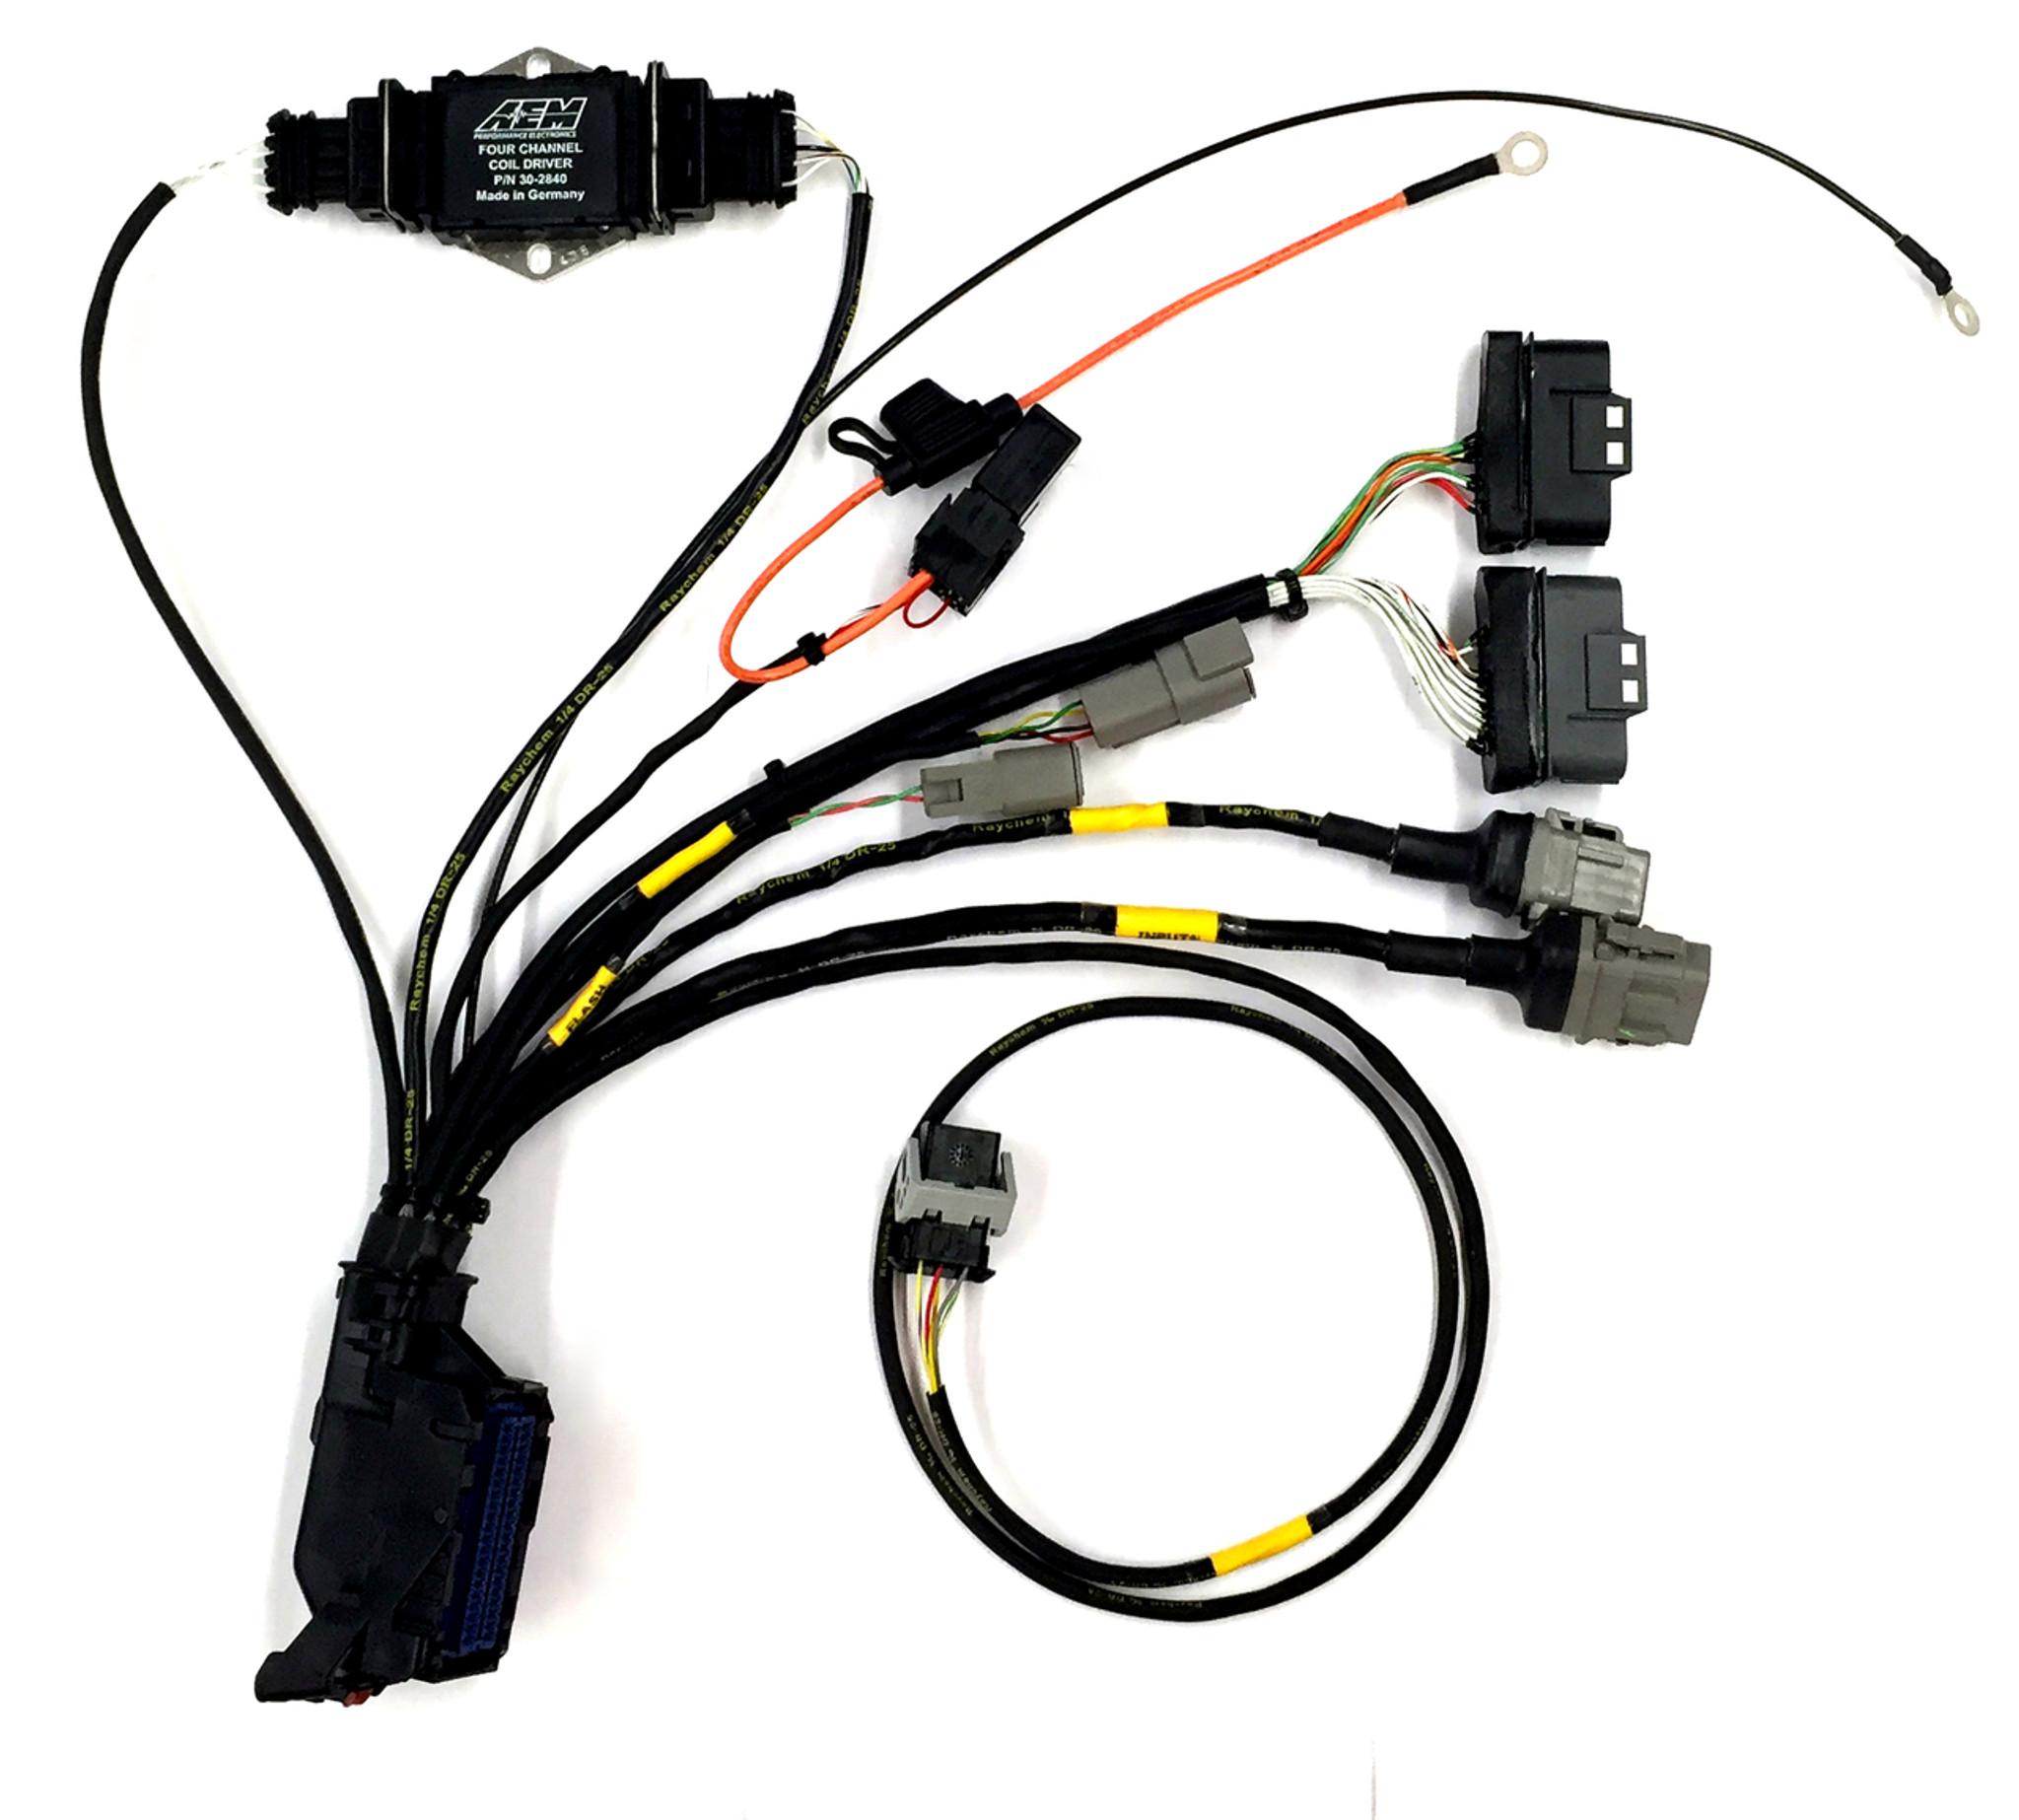 hight resolution of infinity ecu plug and play wiring harness shop htp aem fic wiring harness aem wiring harness